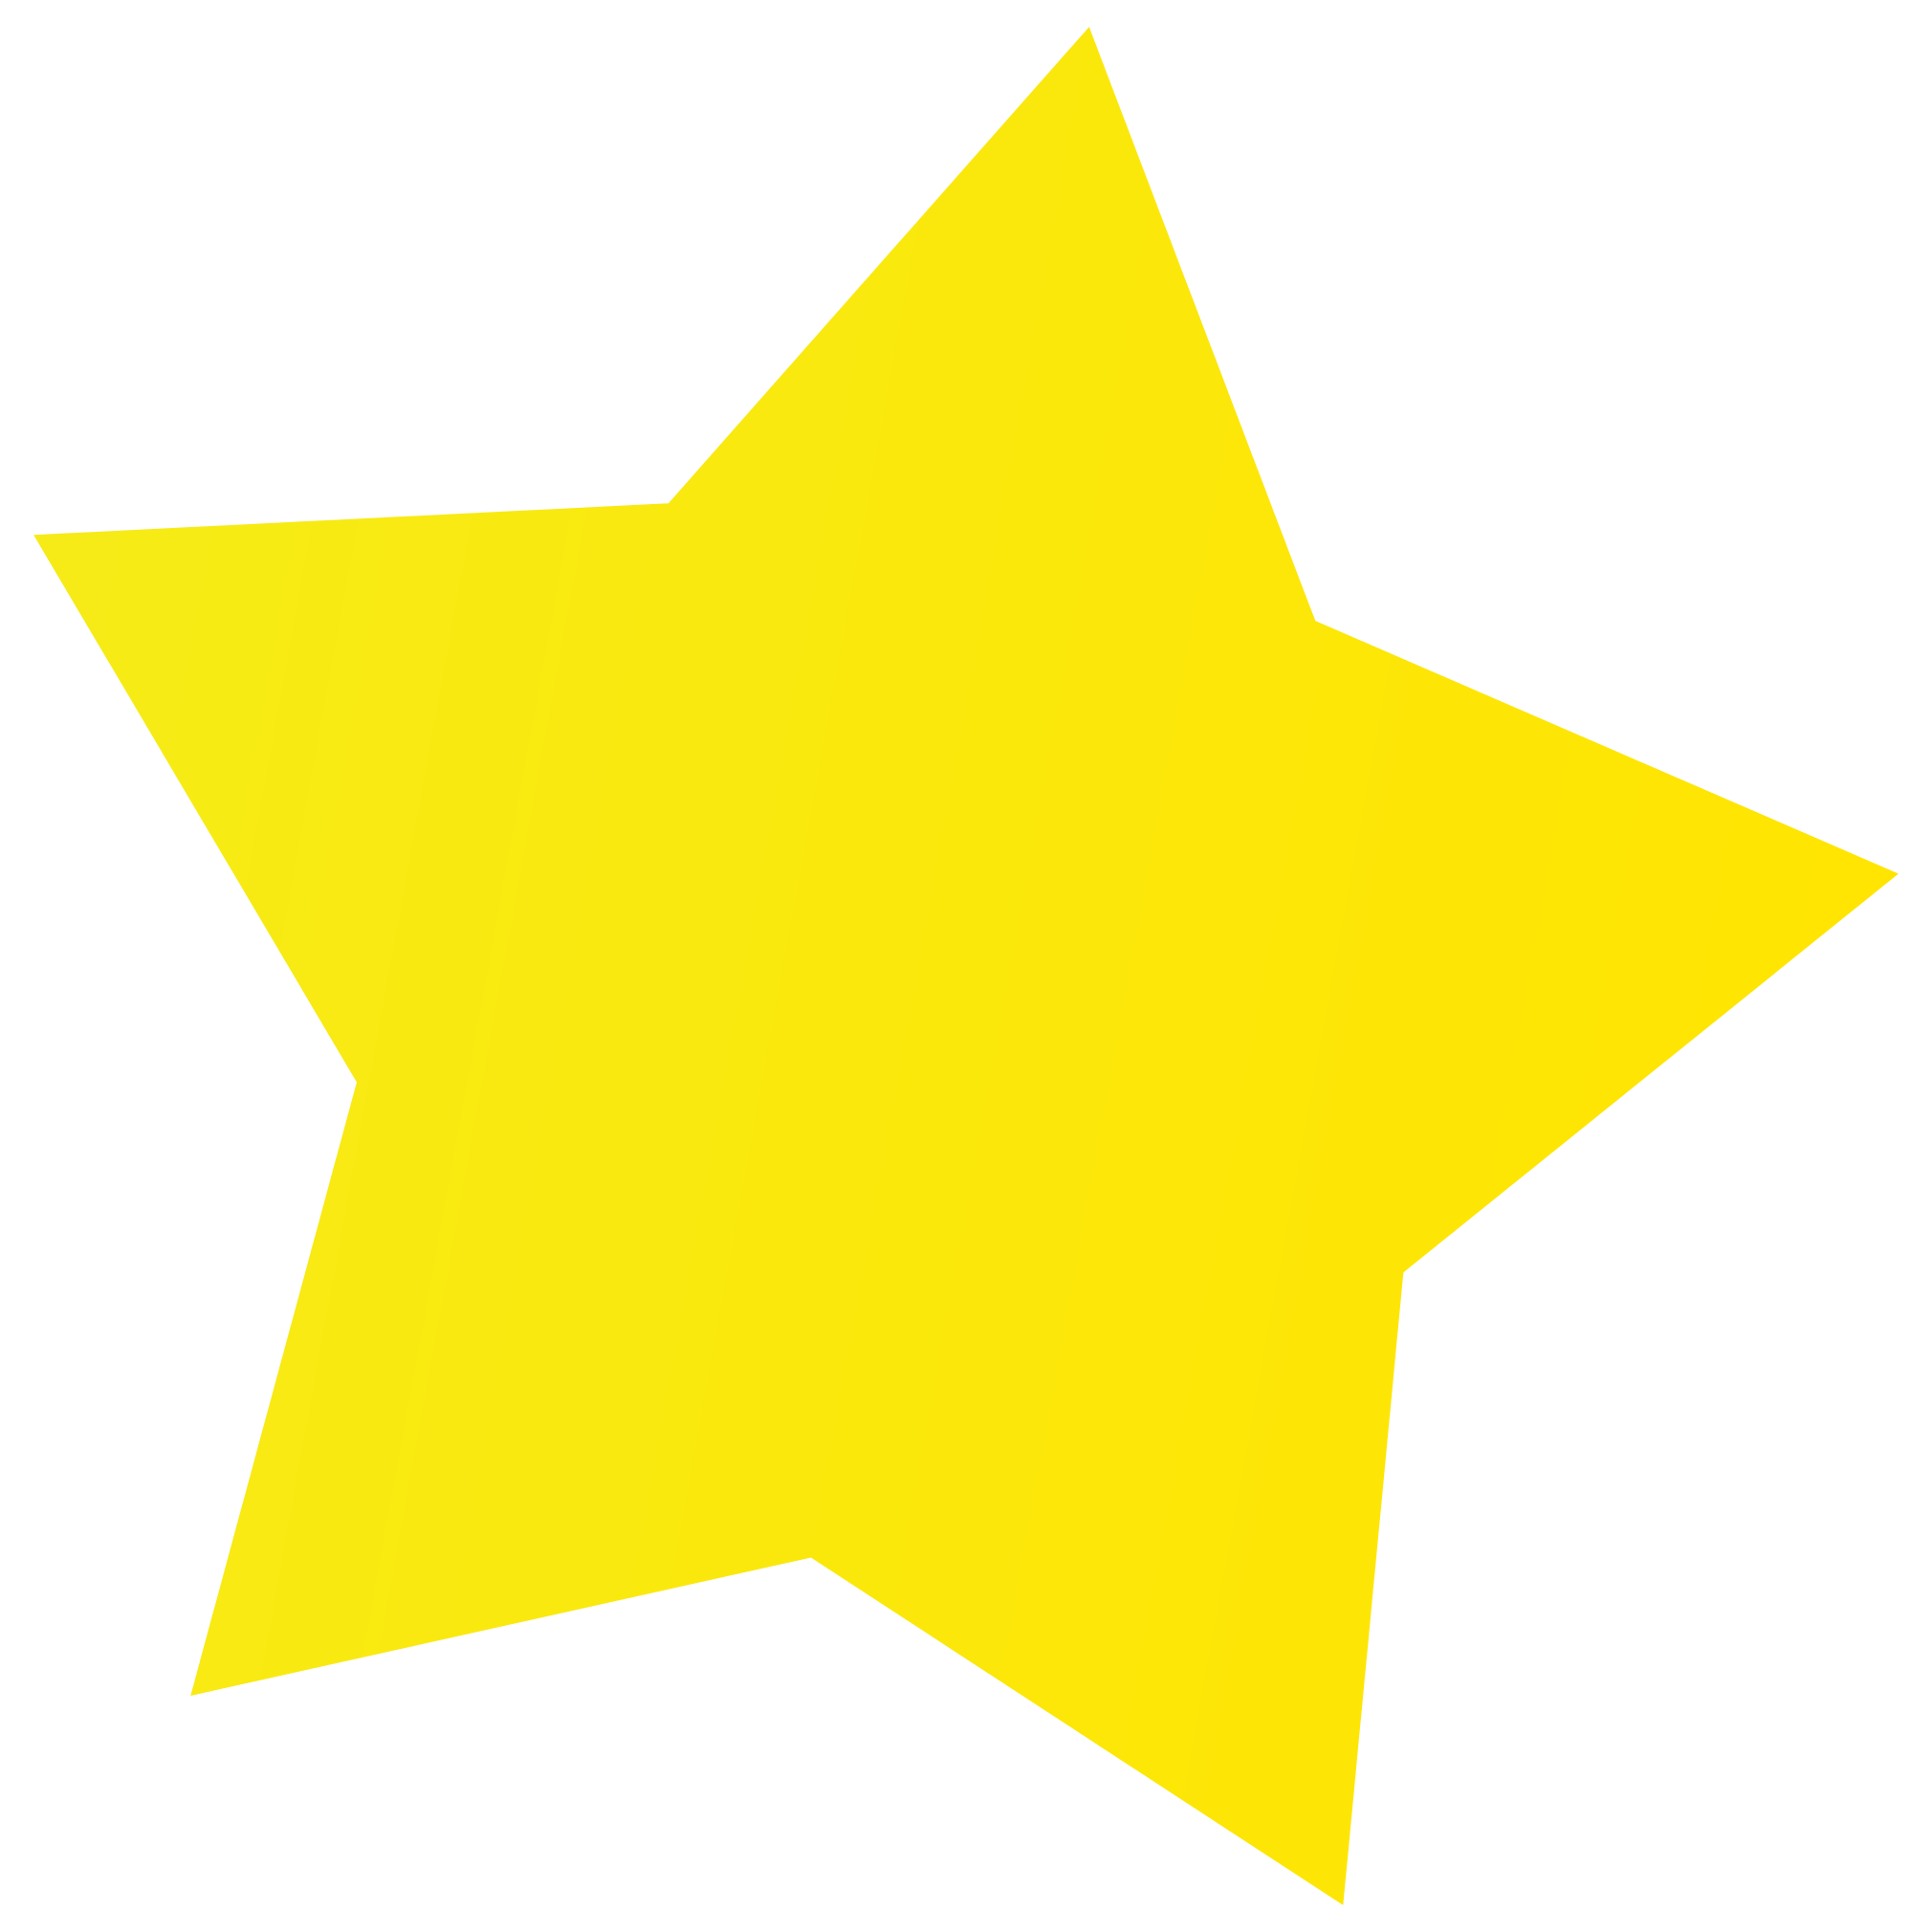 Clipart stars transparent background. Clip art star png